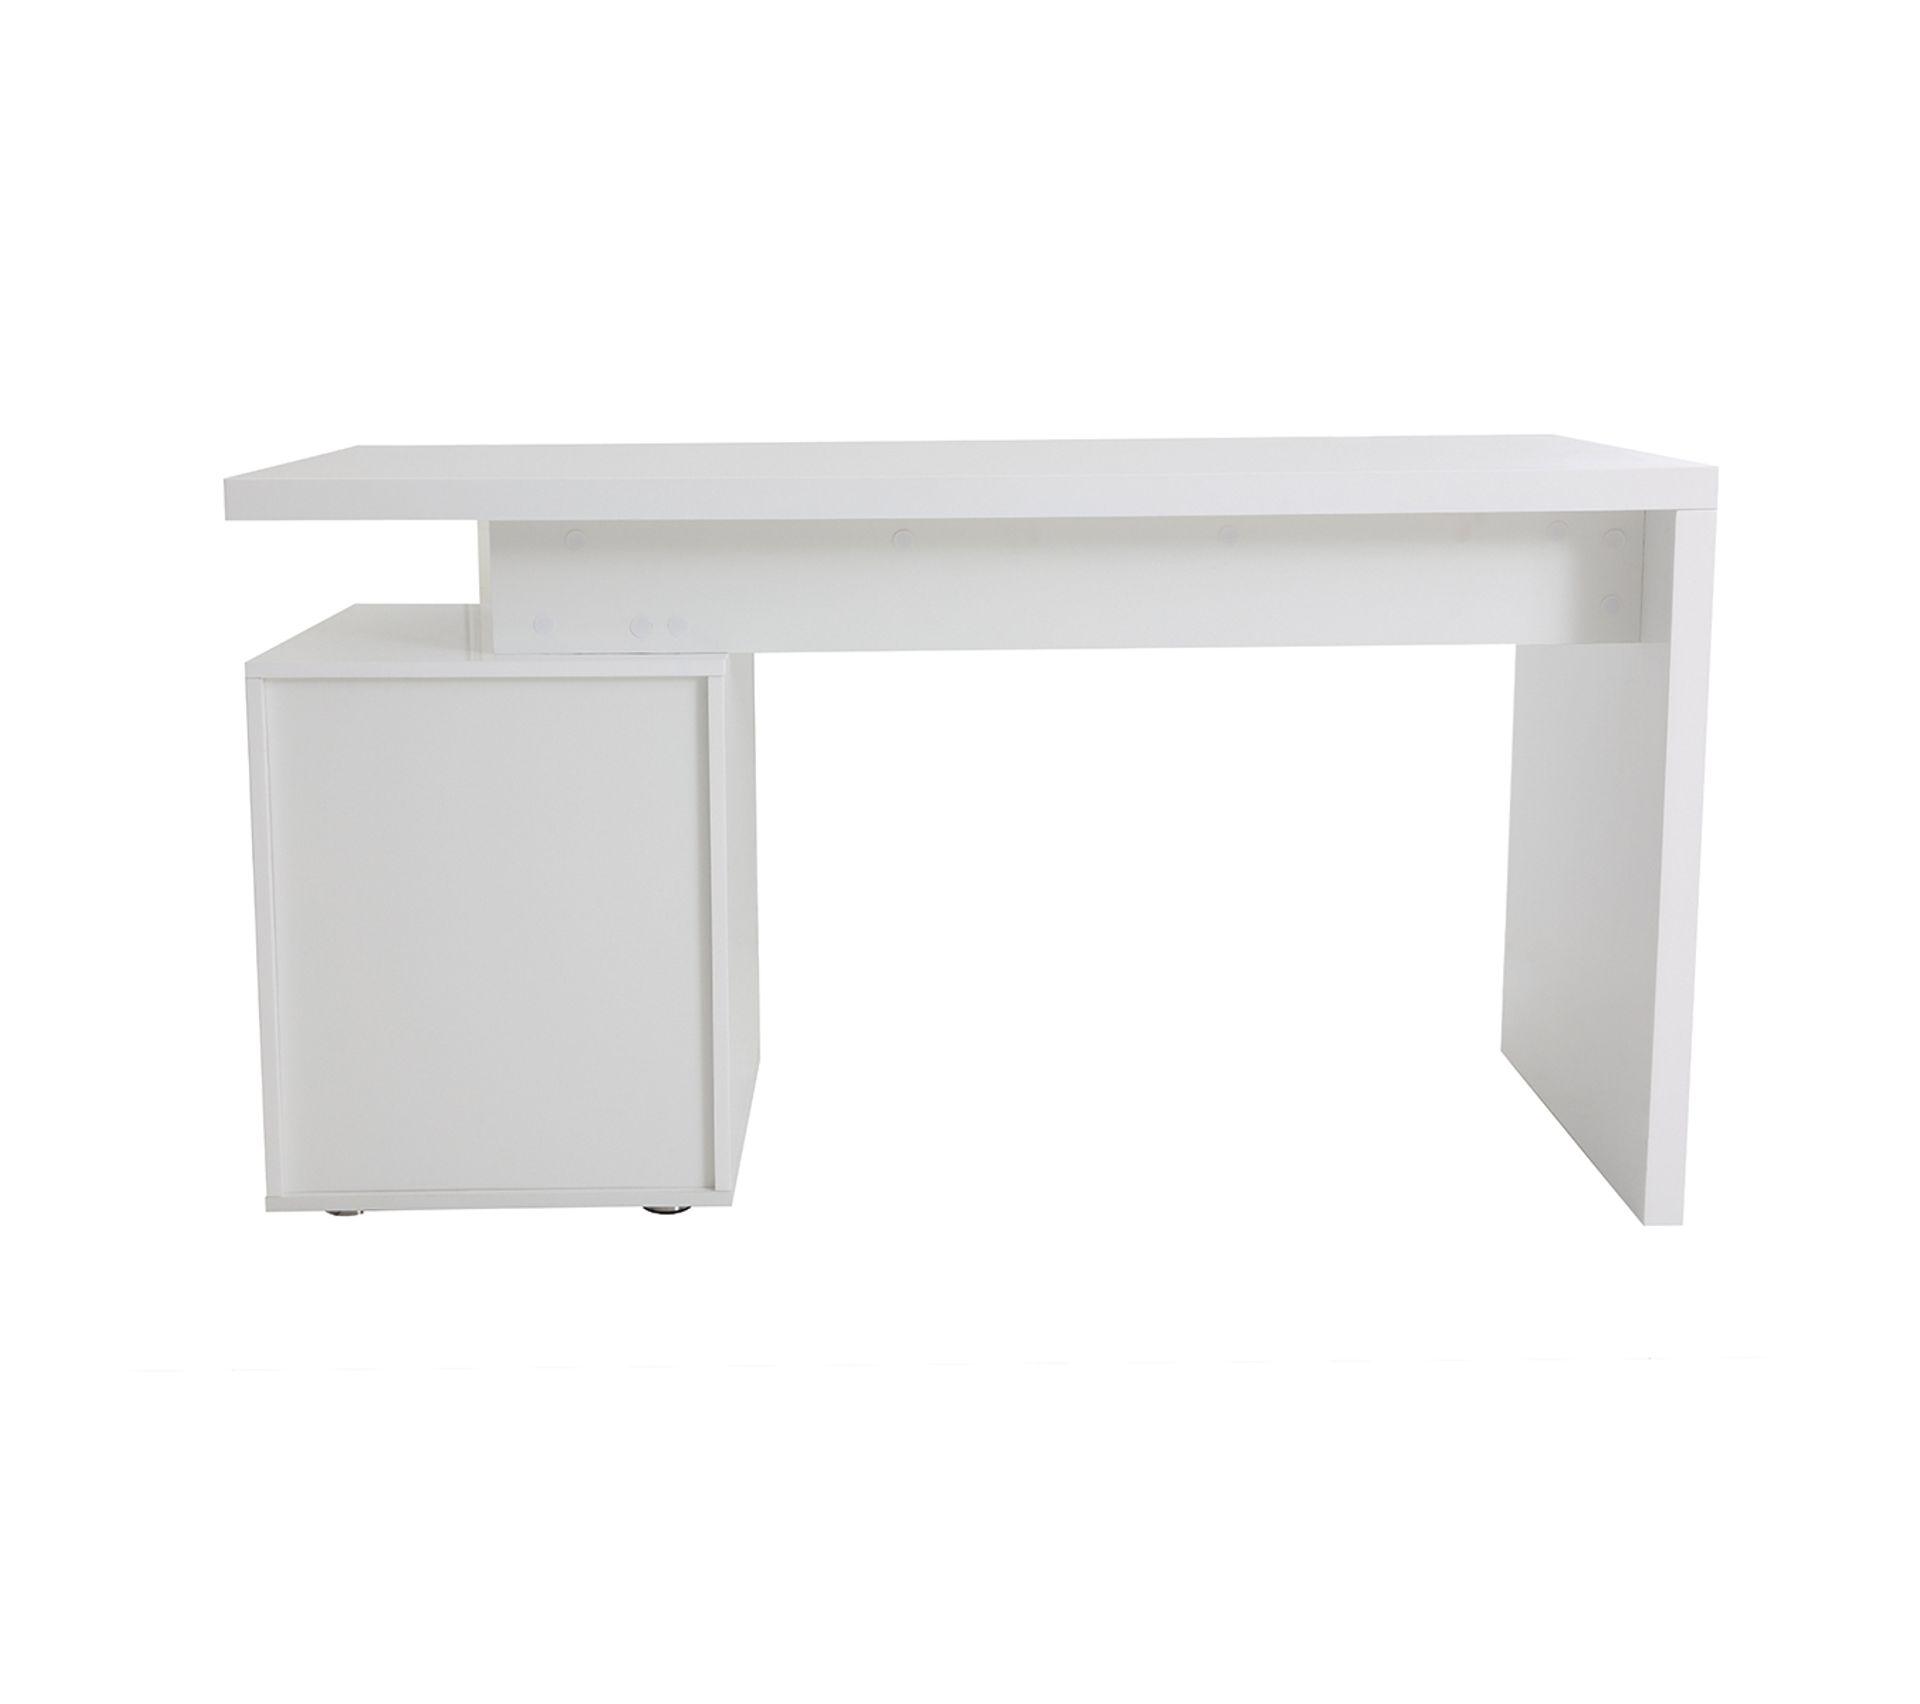 Difference Blanc Brillant Et Blanc Laqué bureau design blanc laqué brillant 3 tiroirs calix